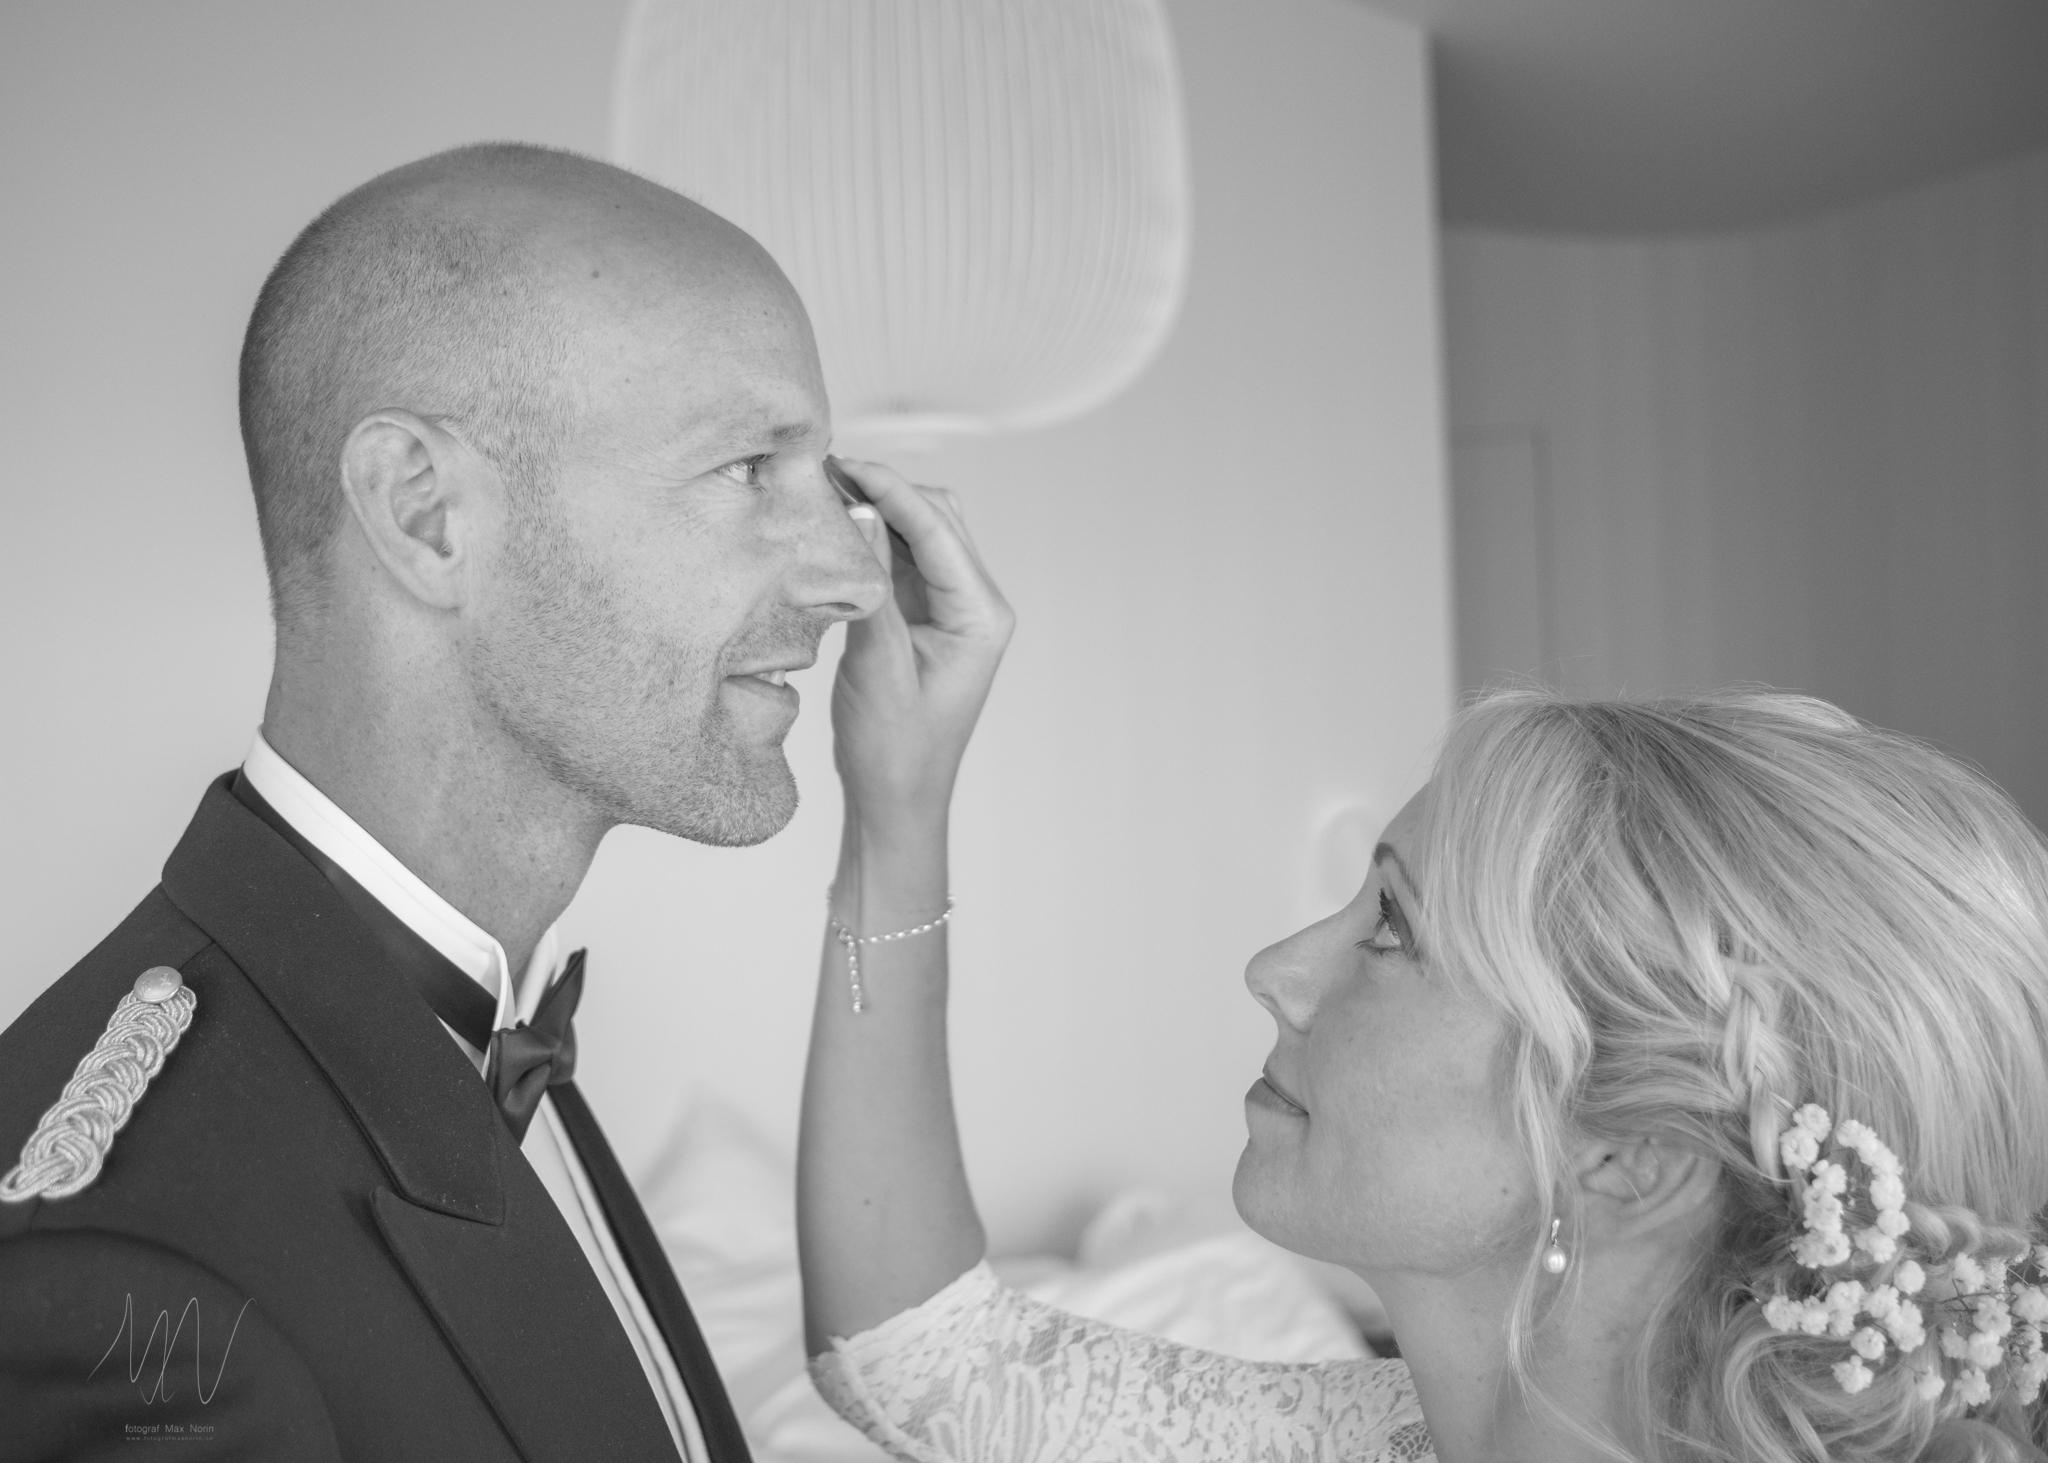 Bröllop-fotografmaxnorin.se-MariaMarcus-5.JPG